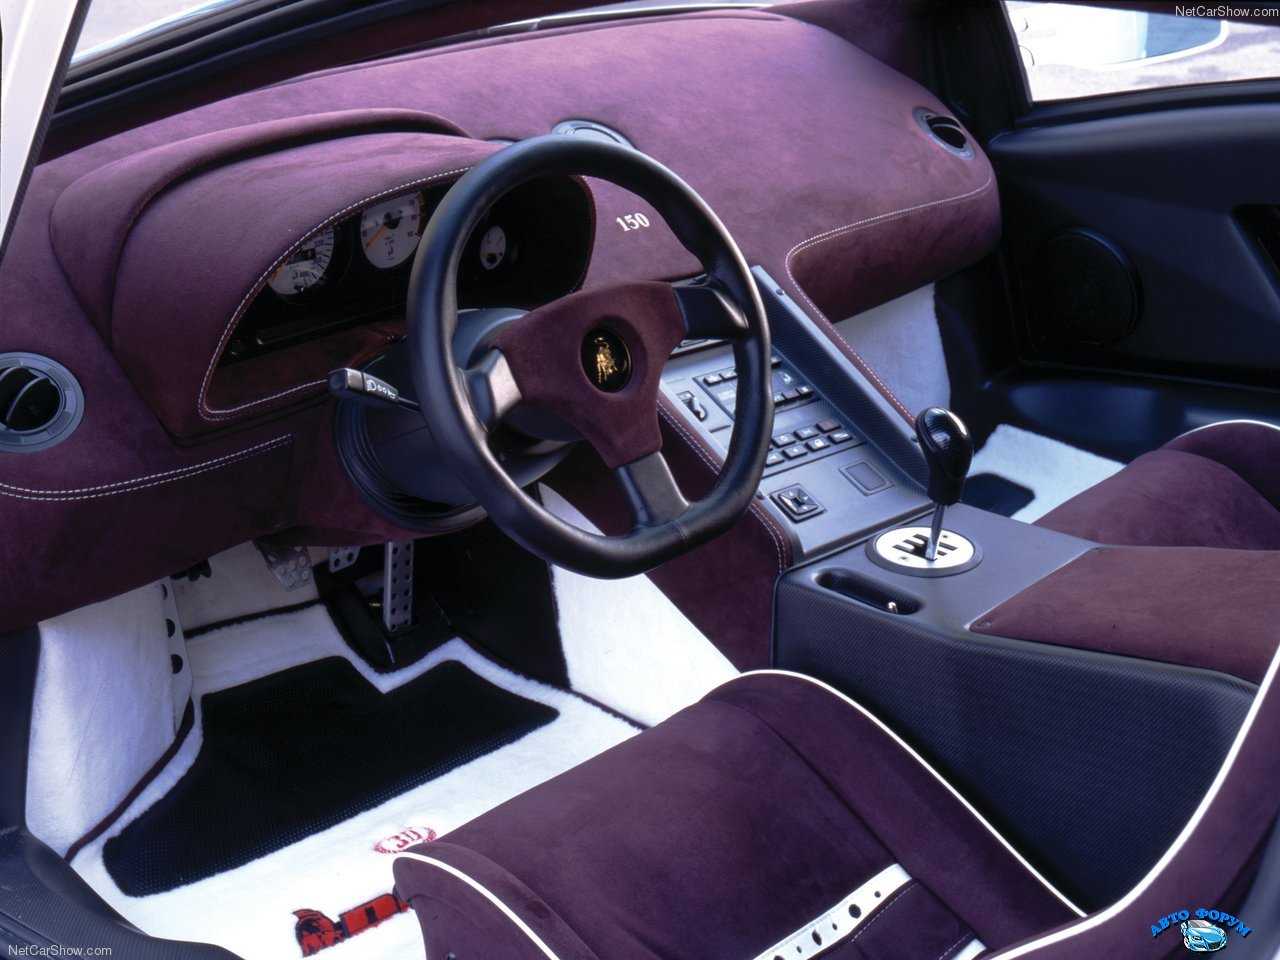 Lamborghini-Diablo_SE_1994_1280x960_wallpaper_06.jpg